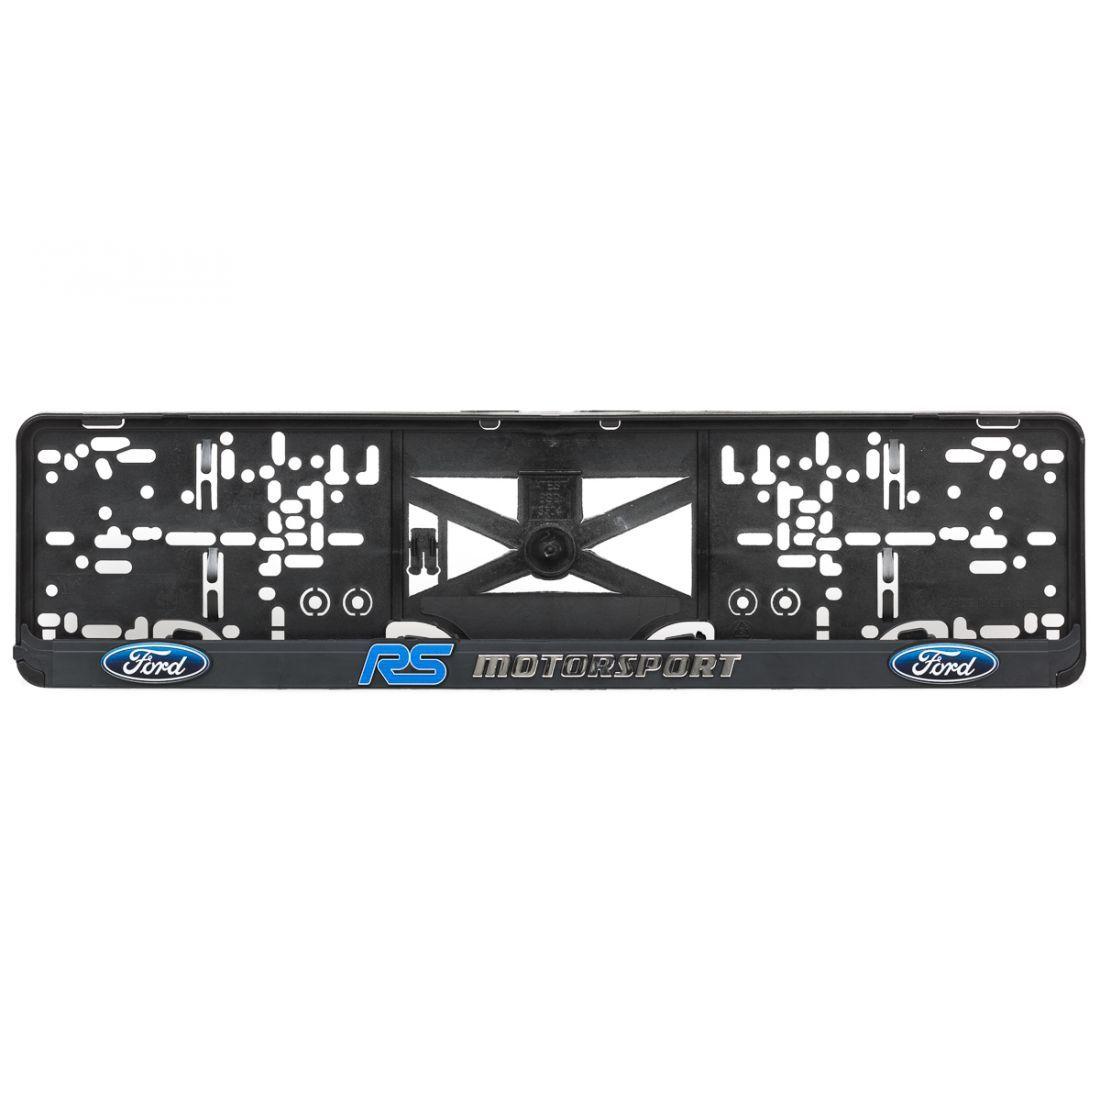 Podložka pod SPZ 3D FORD RS Motorsport